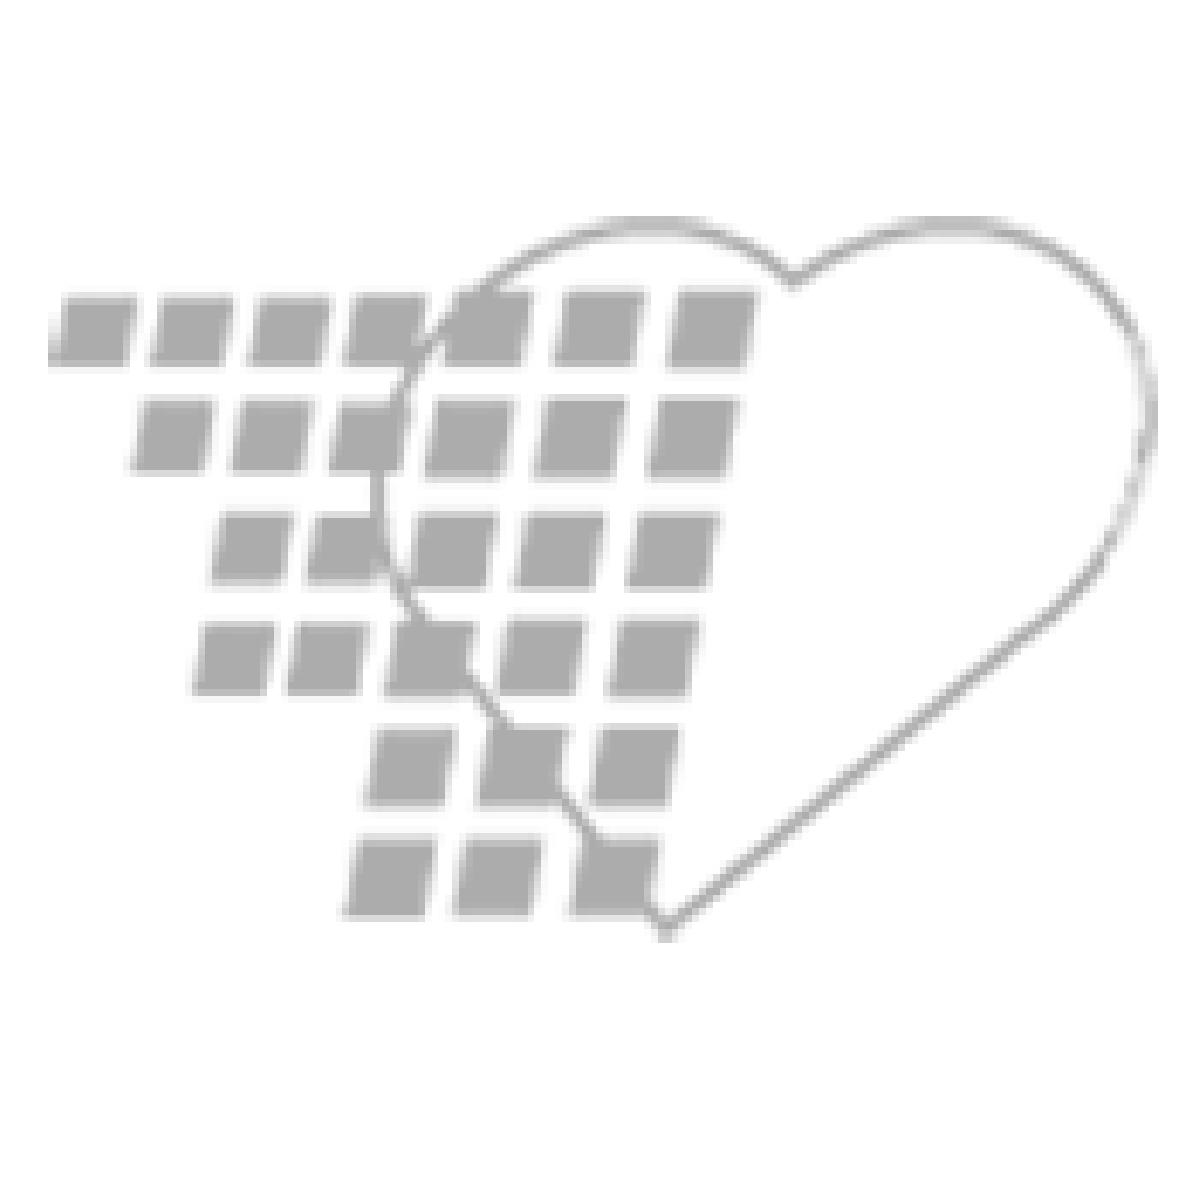 06-93-0077 Demo Dose® Furosemd 40 mg - 1000 Pills/Jar